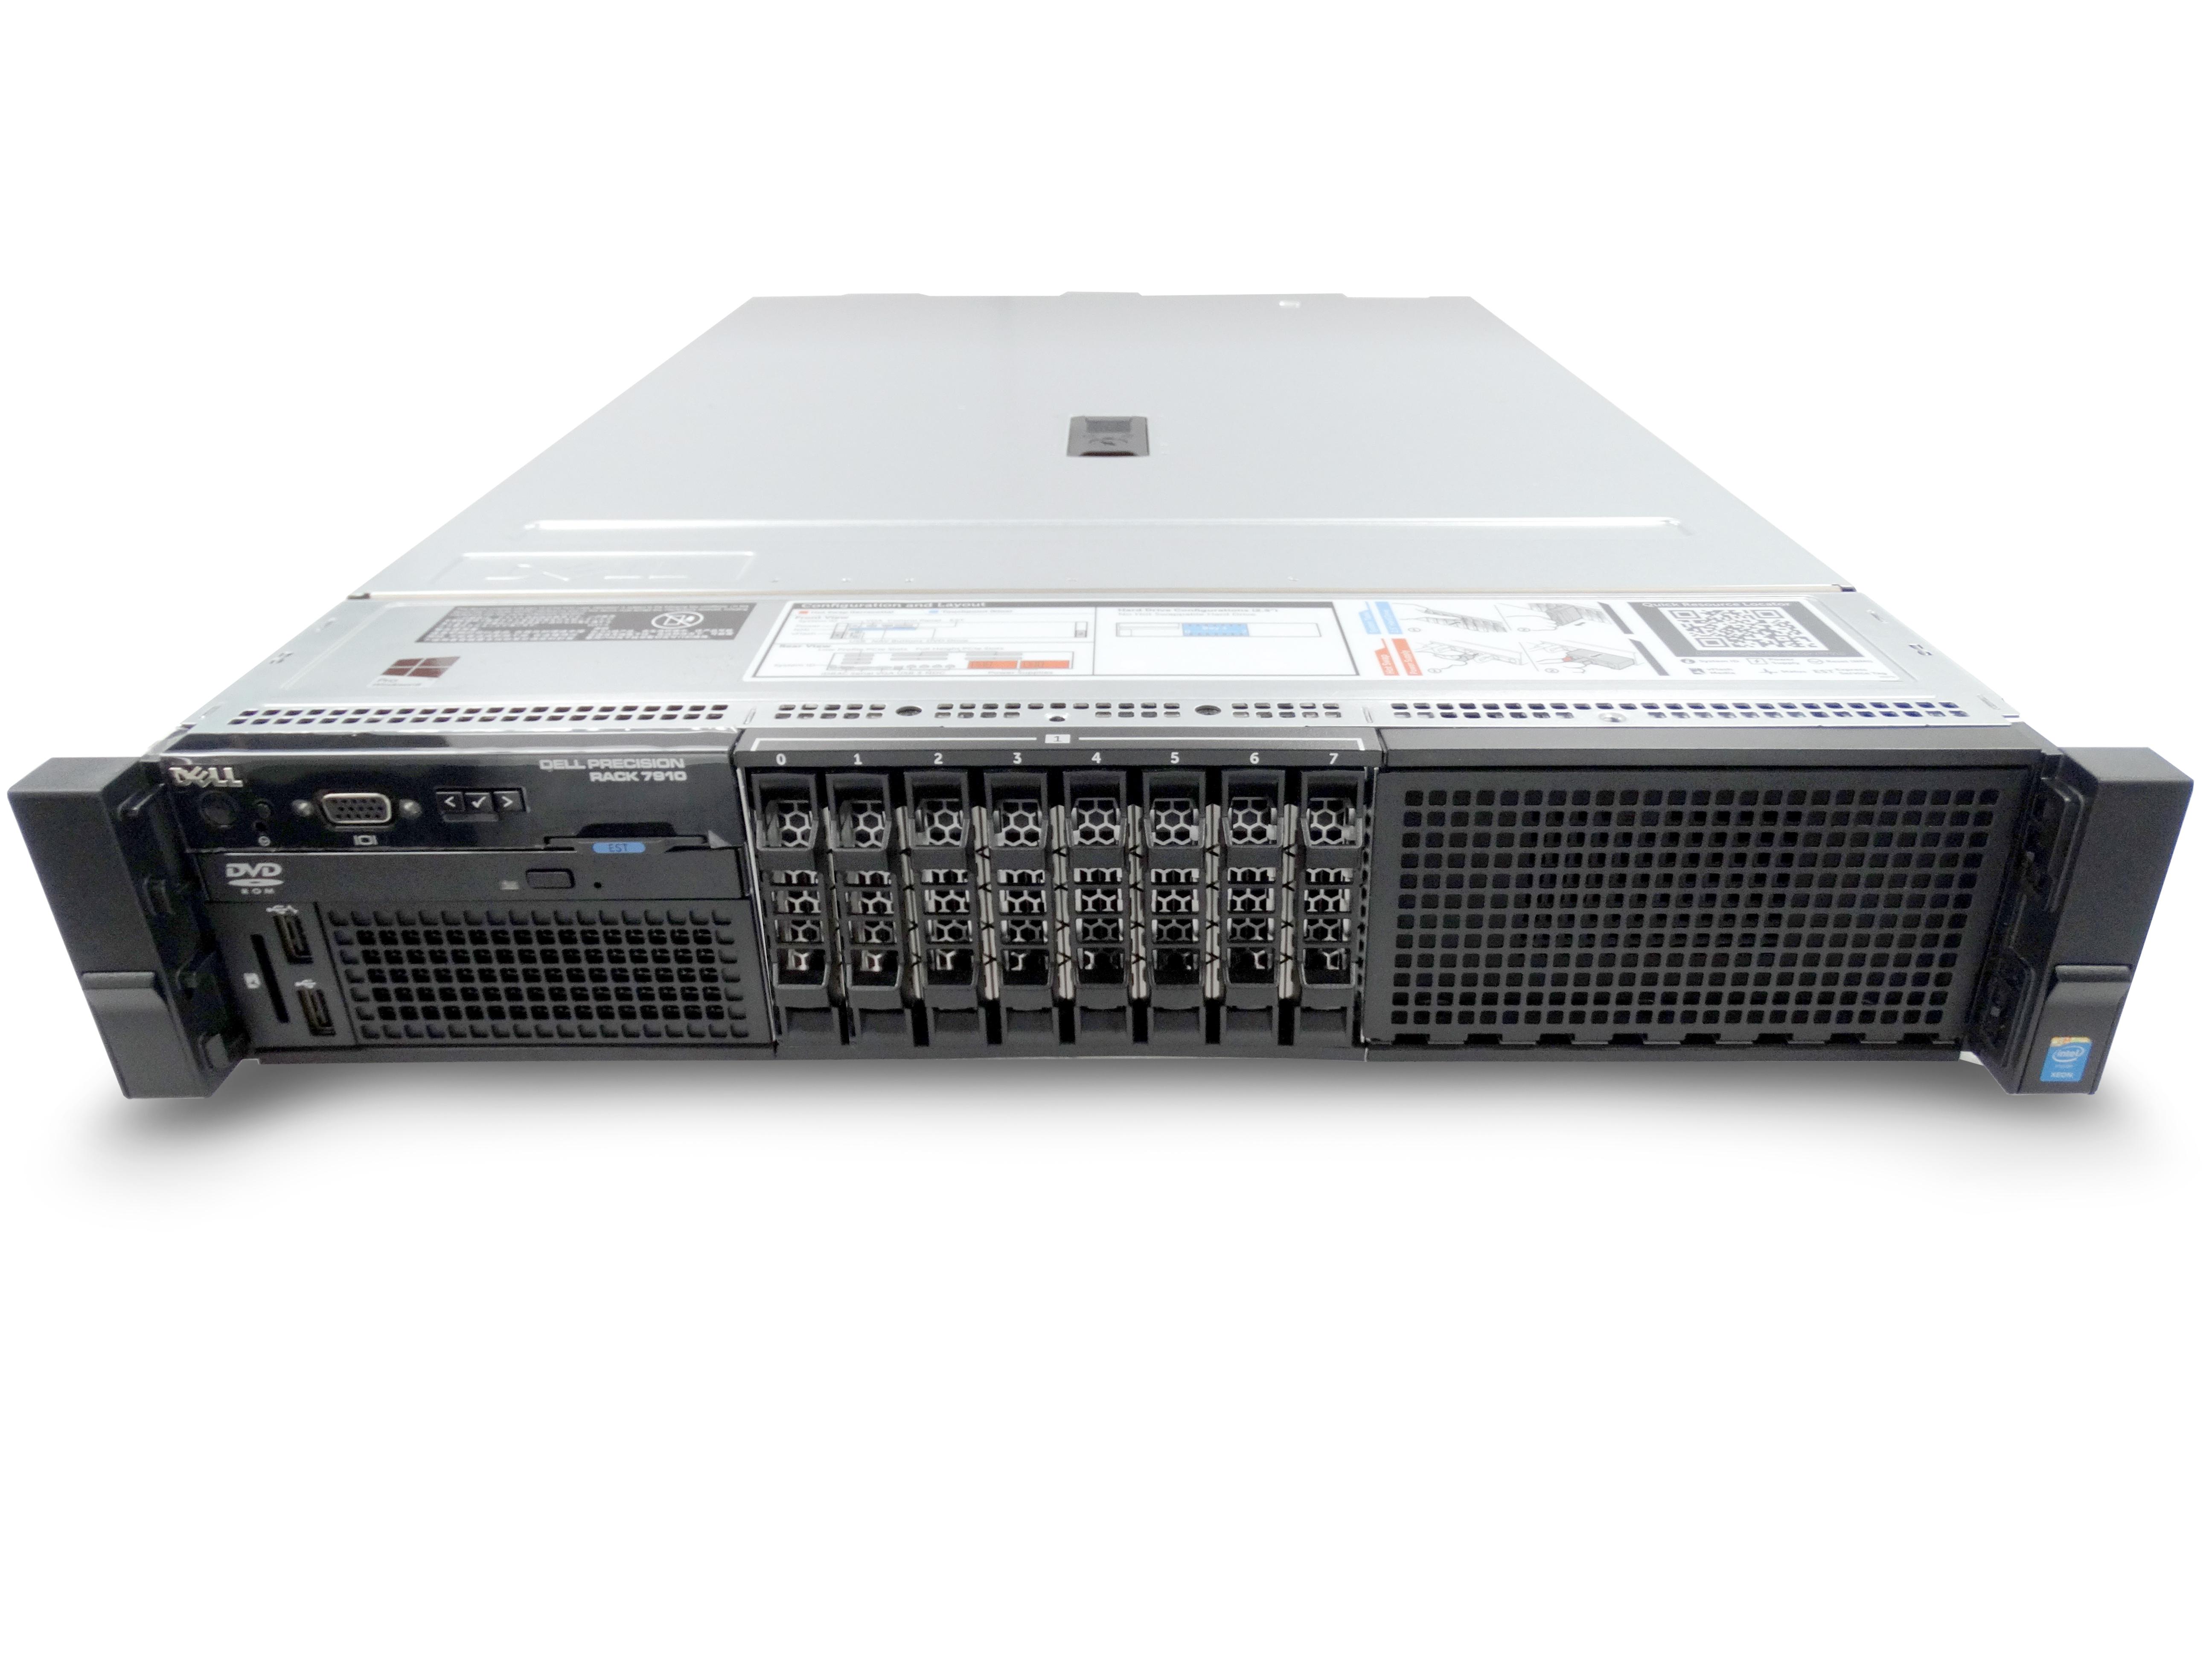 Dell Precision R7910 8-Bay SFF Rackmount Server Workstation